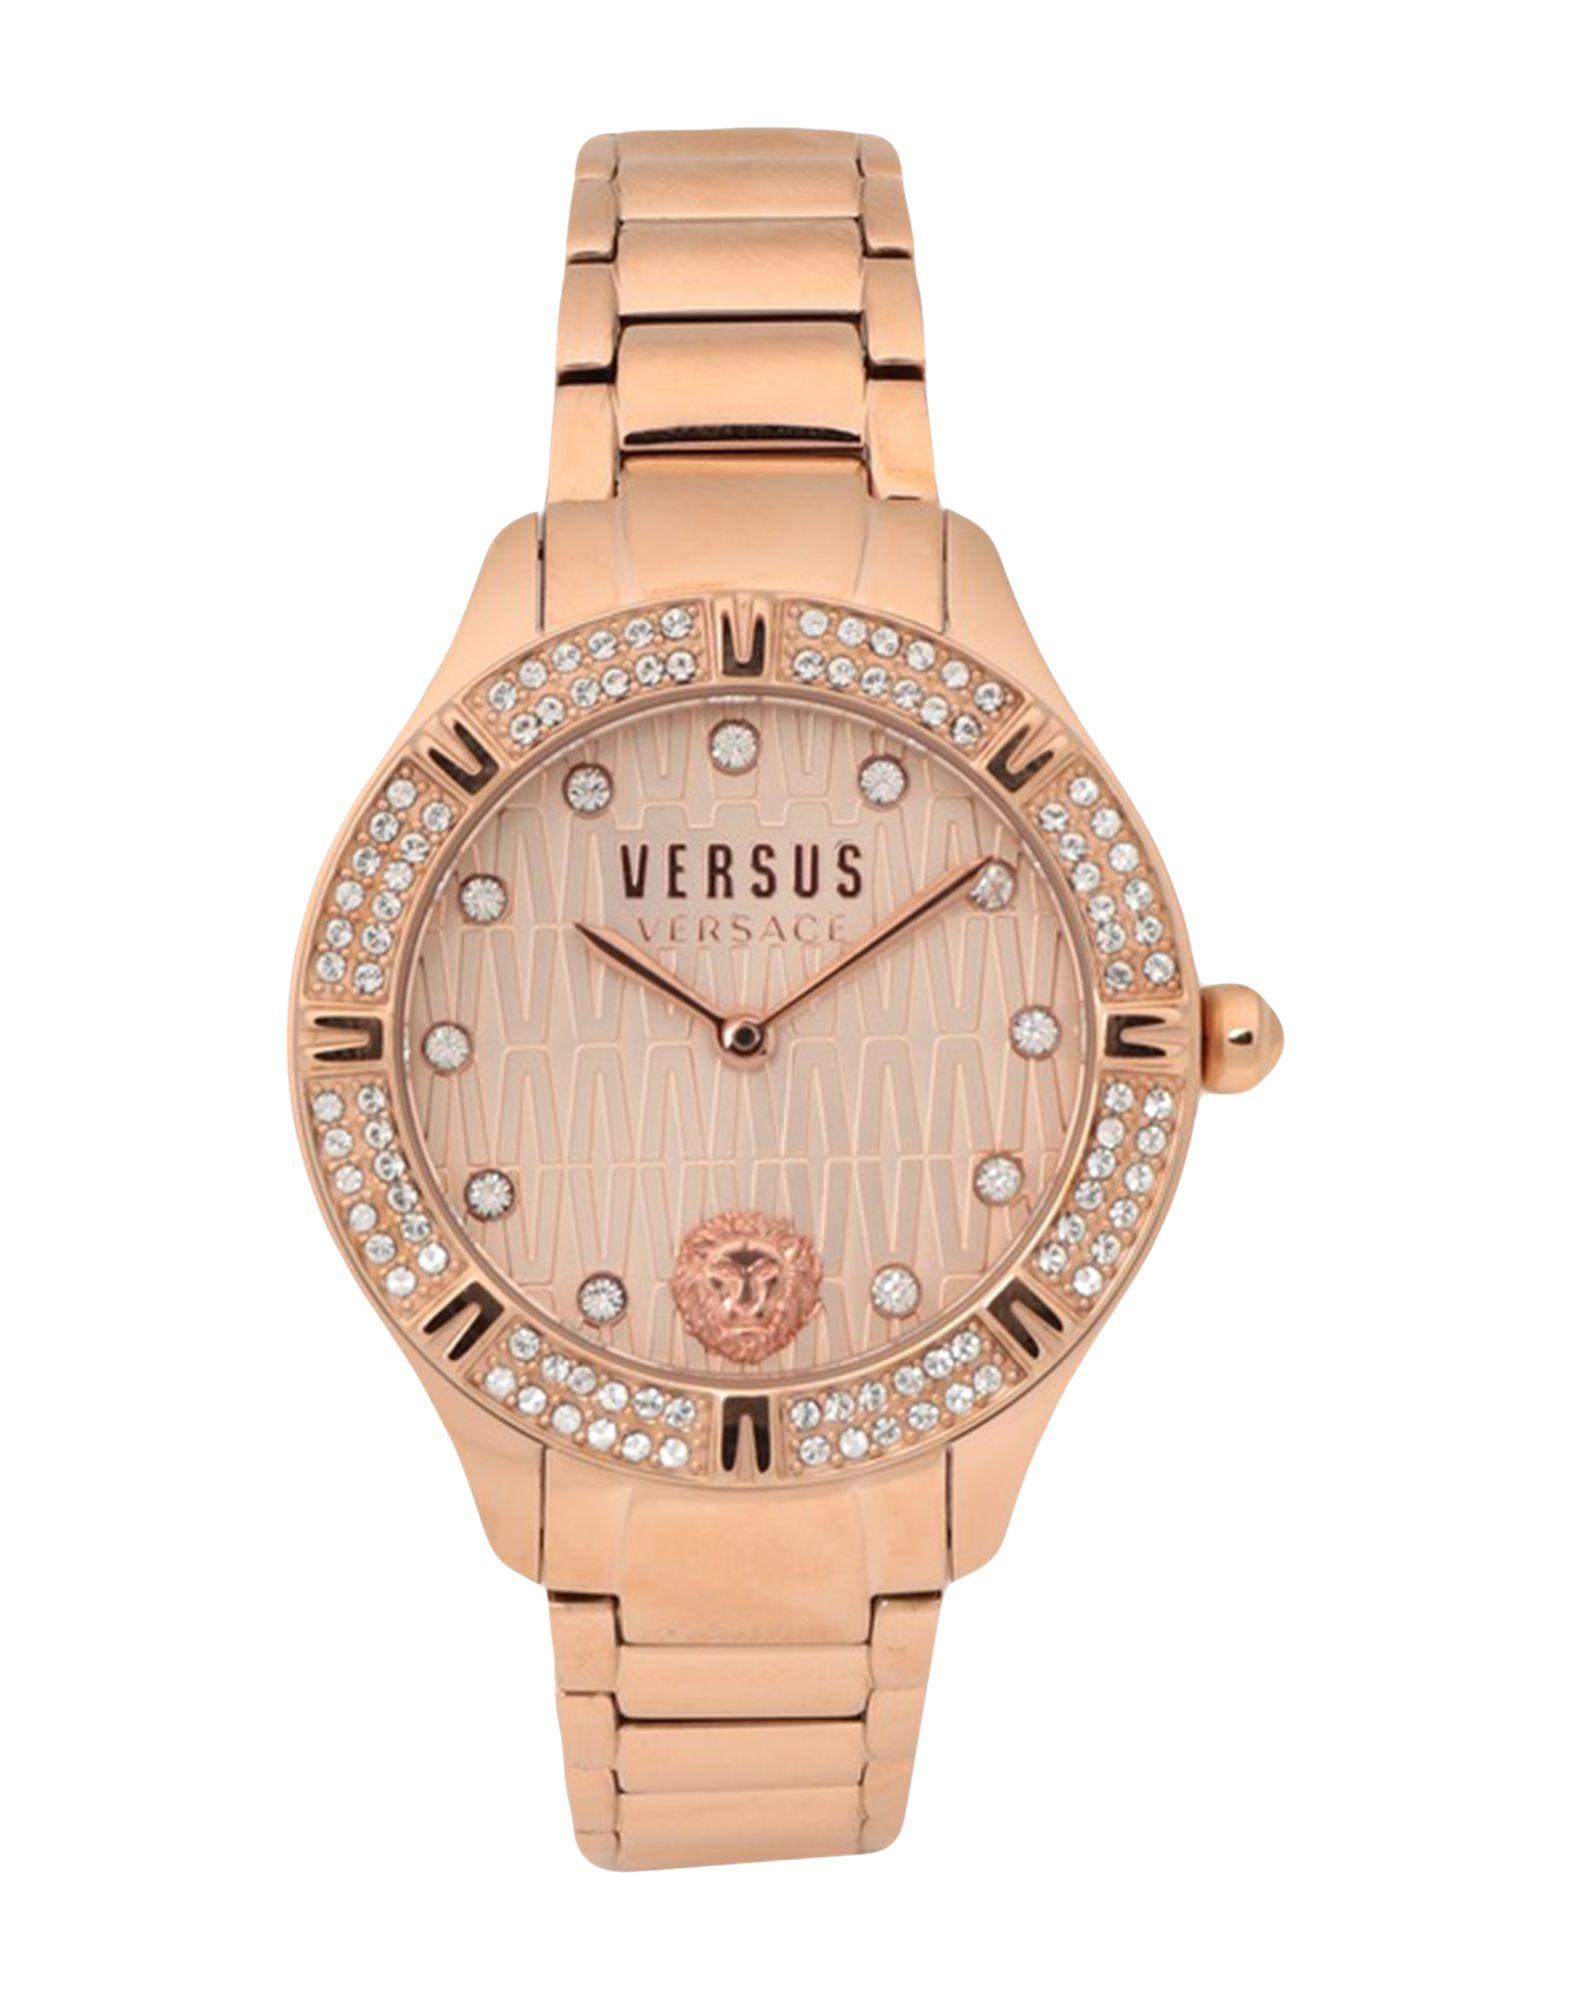 VERSUS VERSACE Wrist watches - Item 58049357